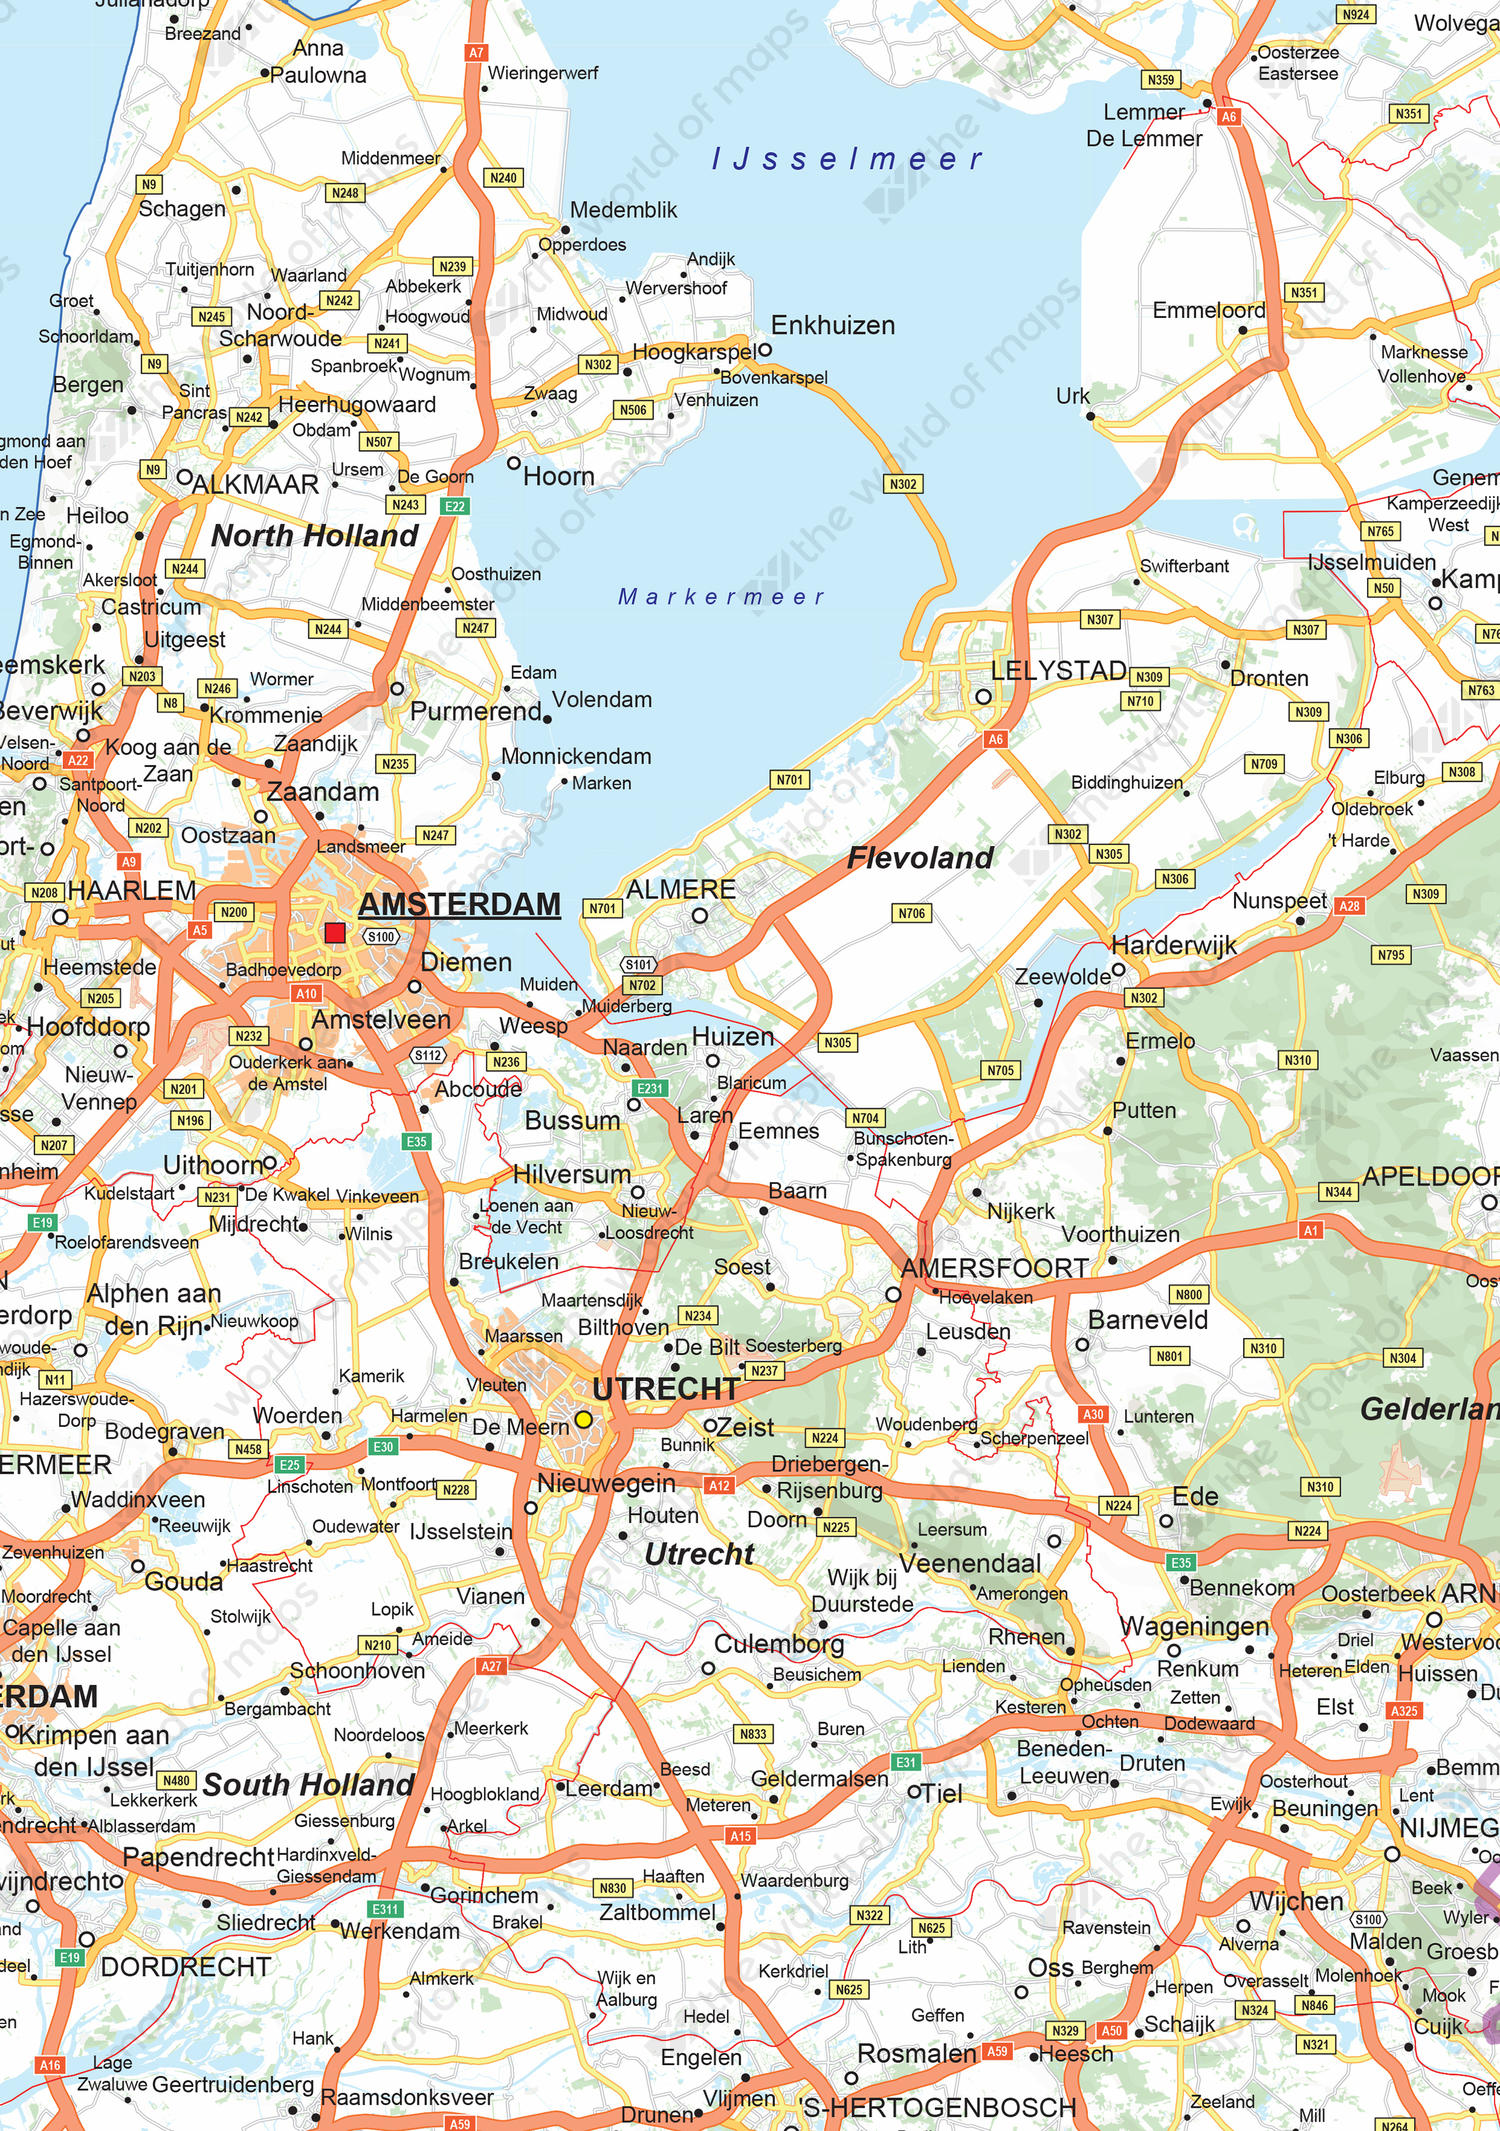 Digital Roadmap The Netherlands